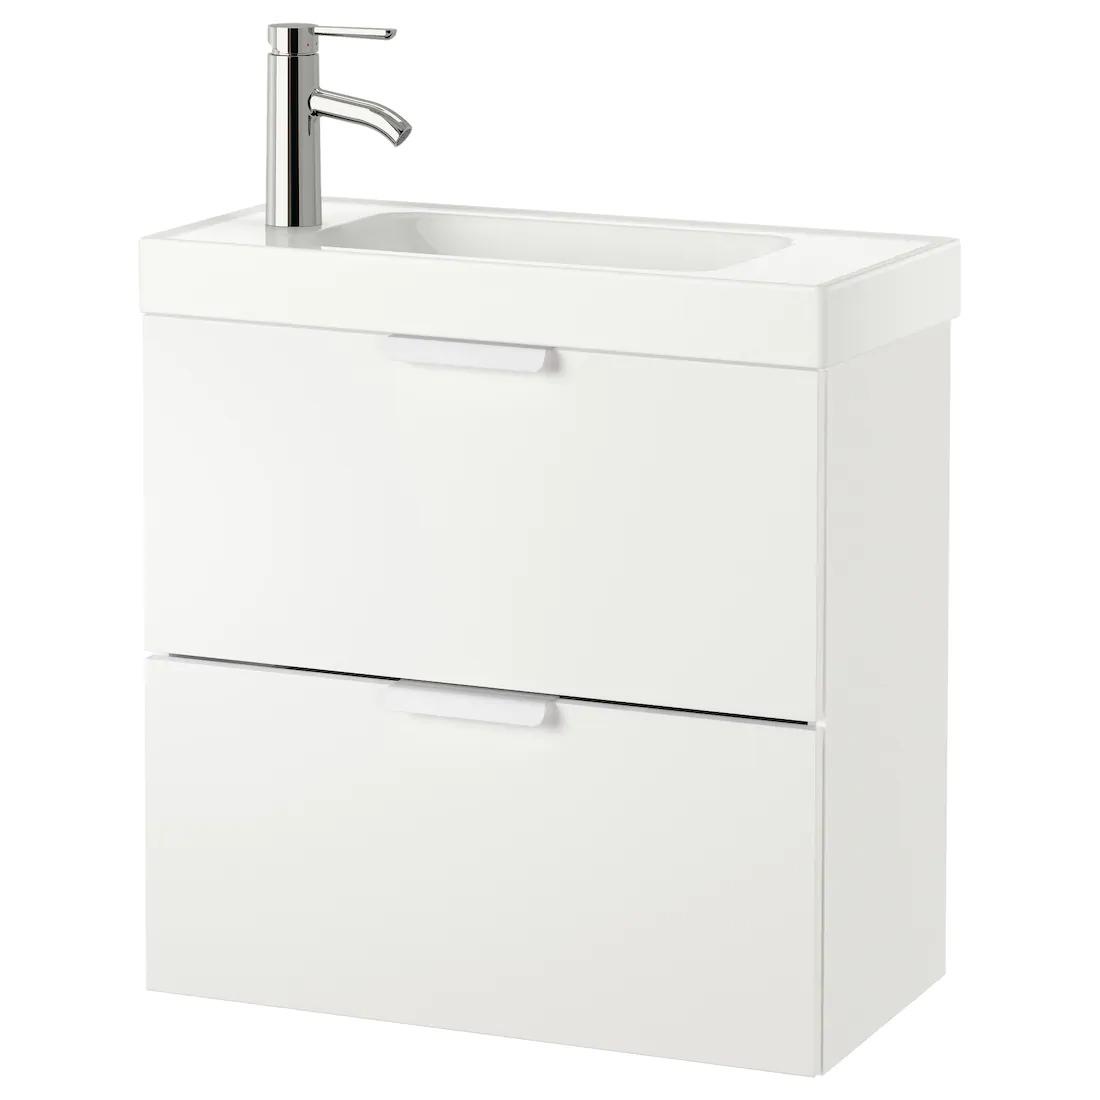 GODMORGON / HAGAVIKEN Armario lavabo 2 cajones, blanco, Dalskär grifo, 63x34x65 cm